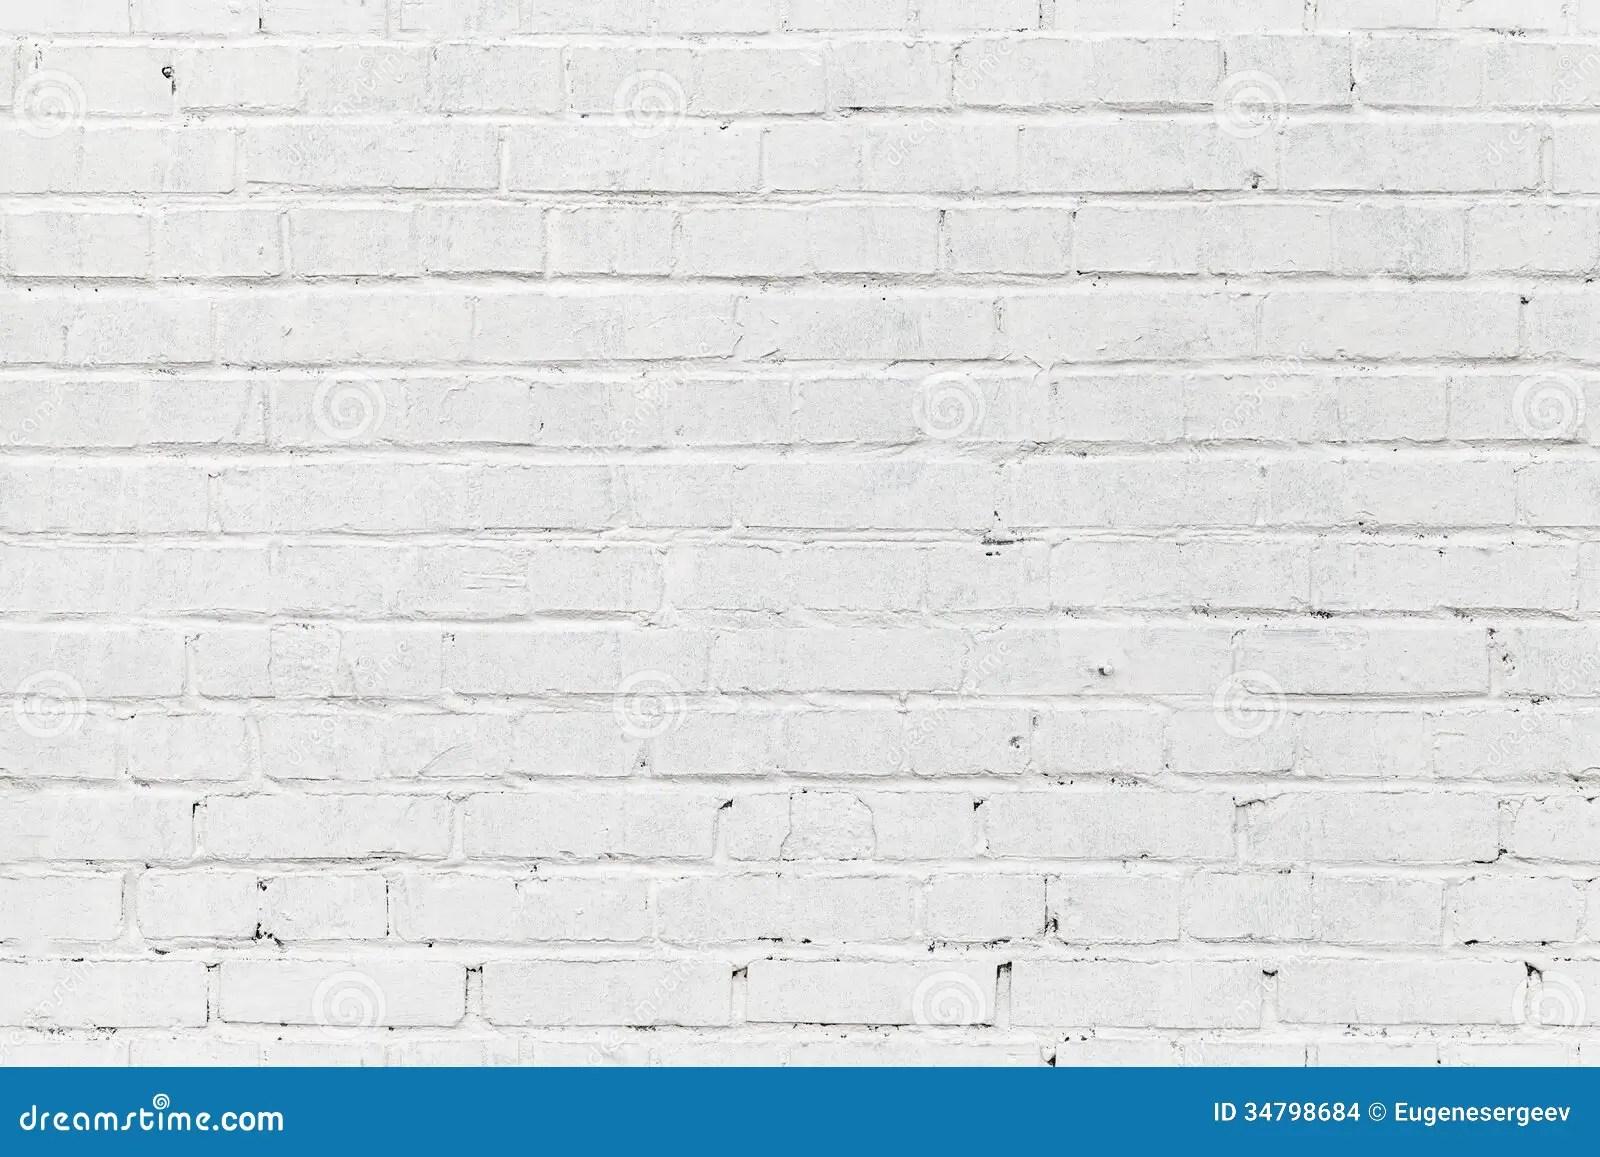 White Brick Wall Seamless Photo Texture Stock Images